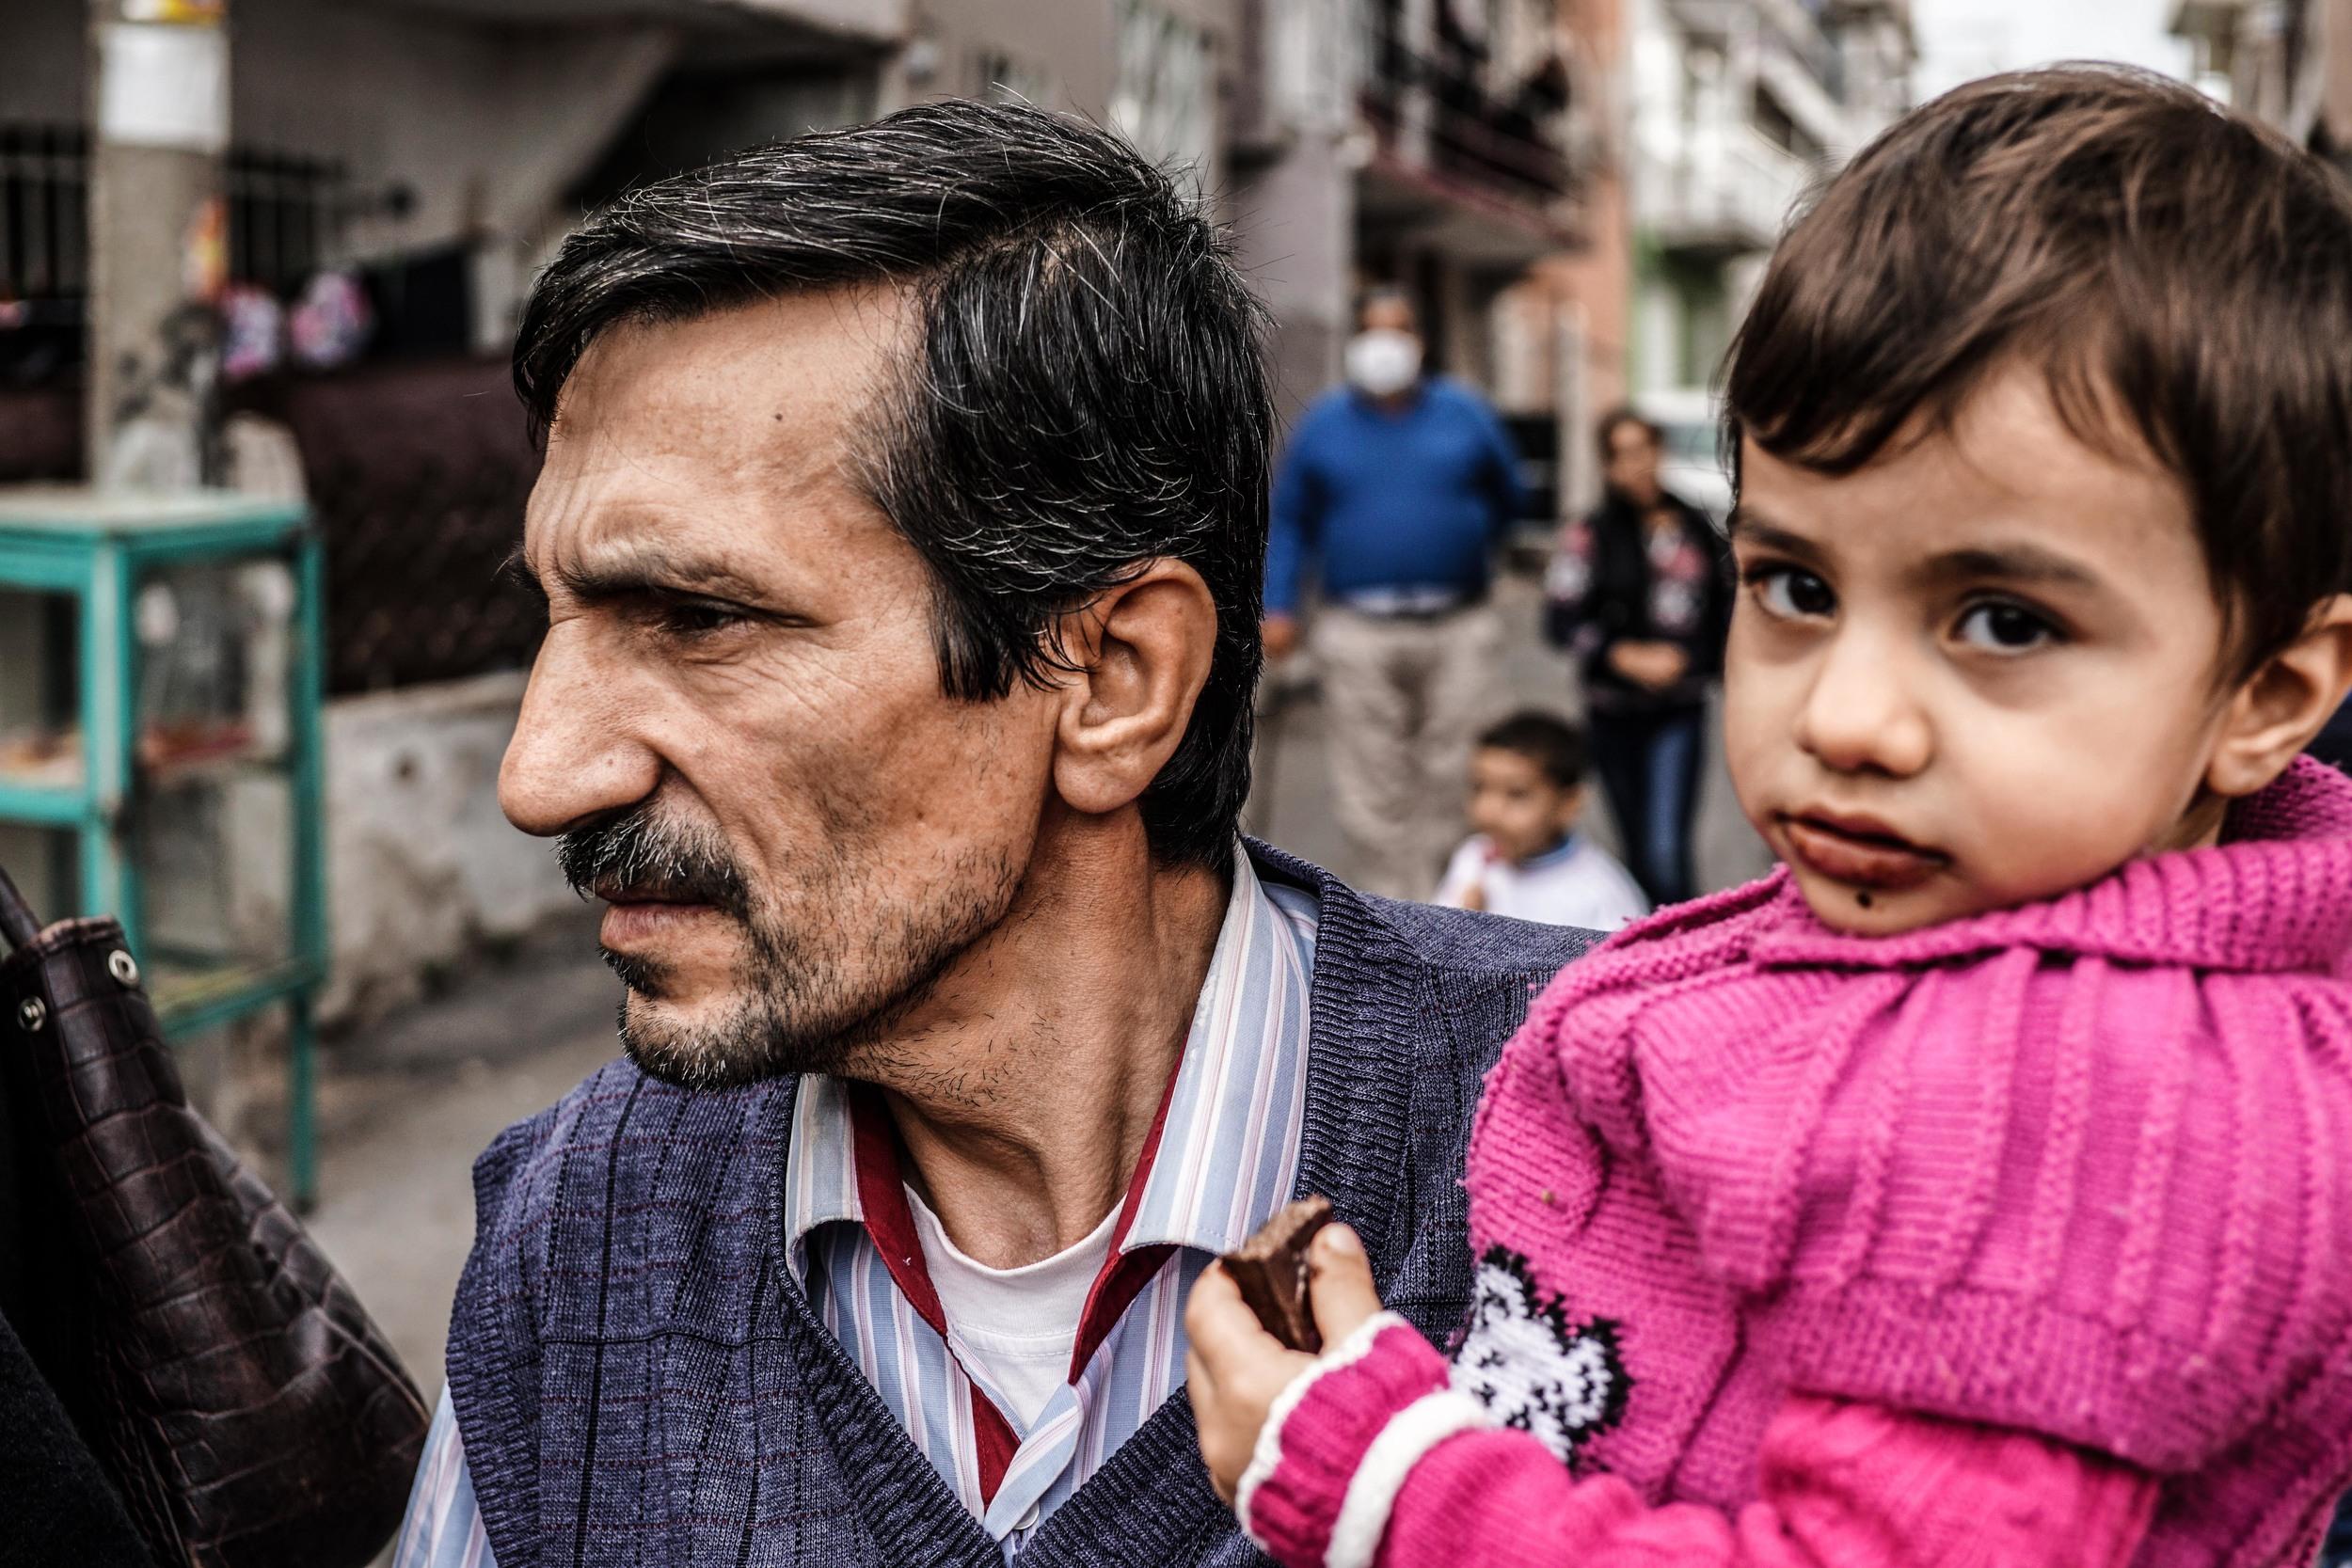 Syrian Refugee Crisis Izmir November 2015 9.jpg